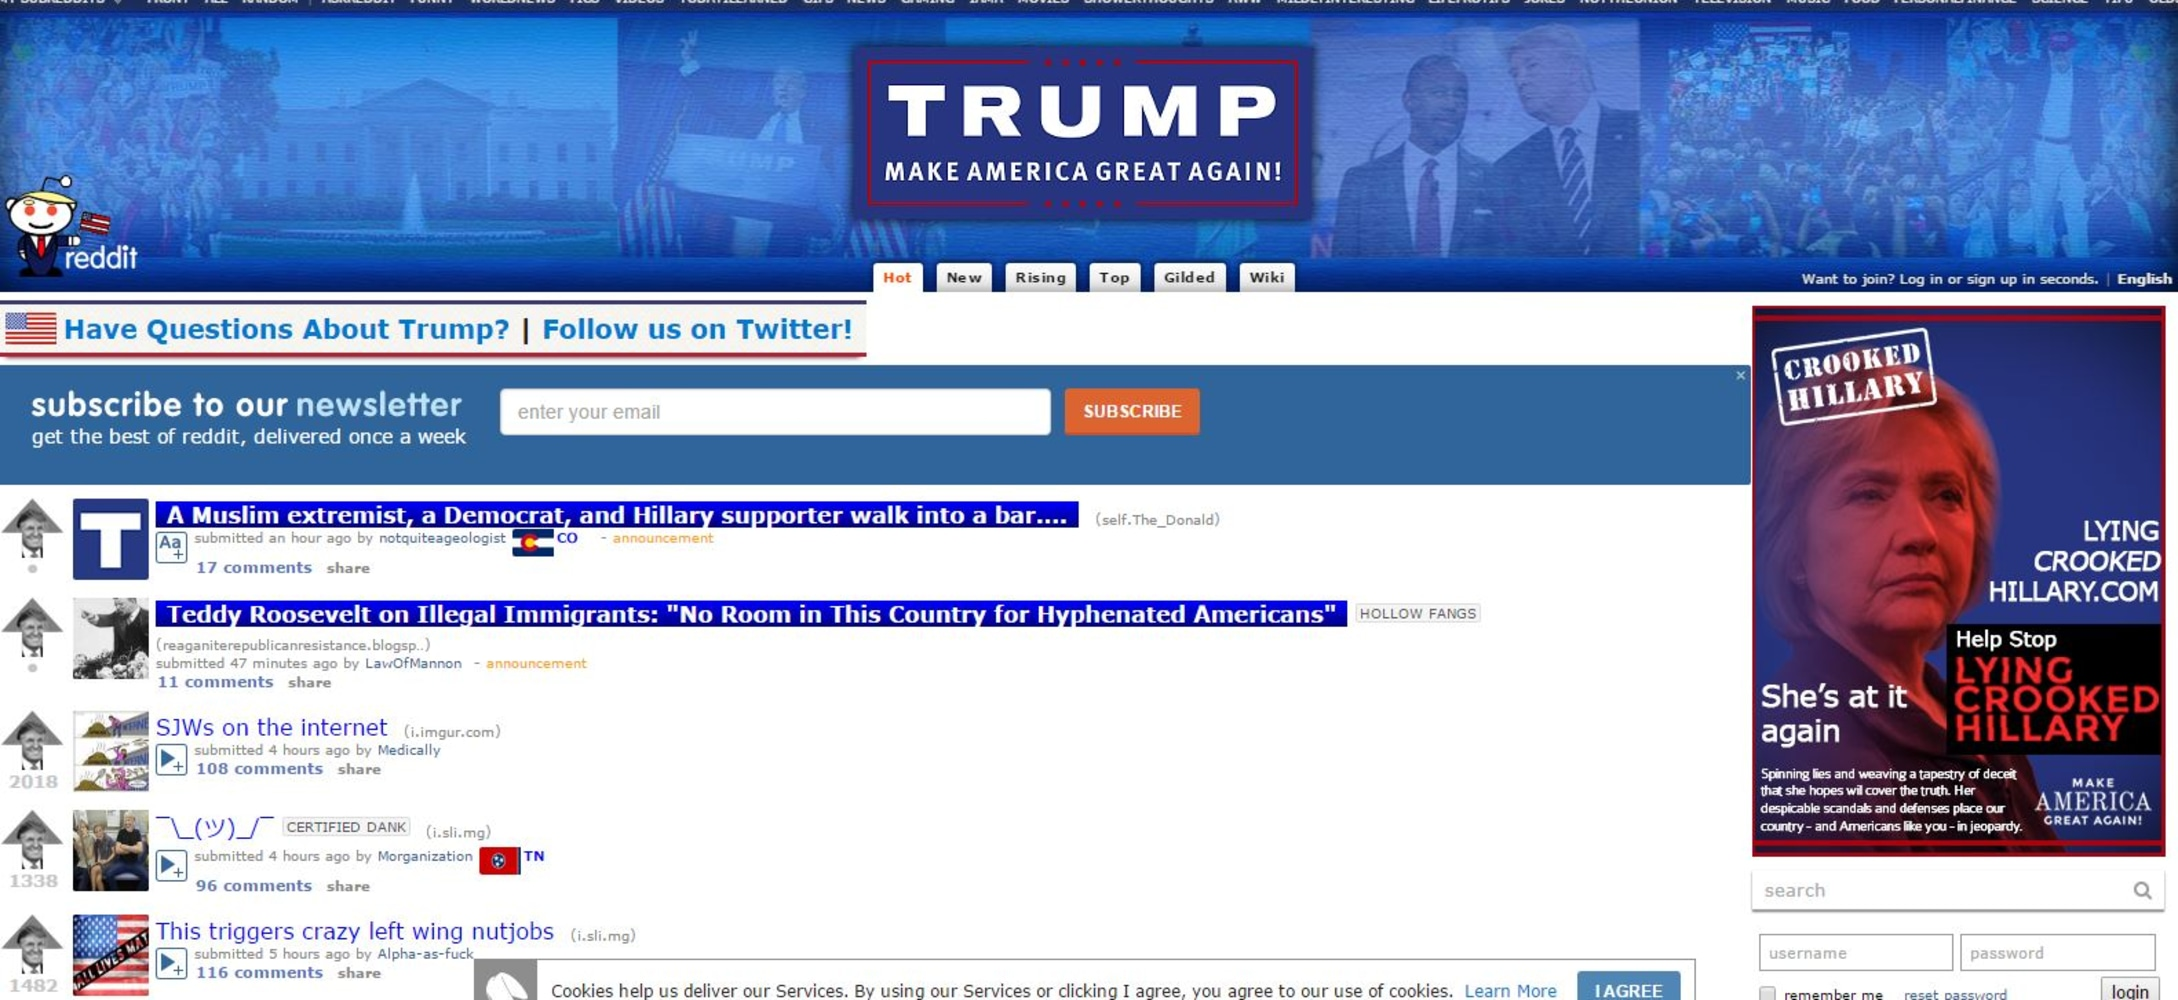 Donald Trump's Reddit Fan Club Faces Crackdown, Infighting - NBC News